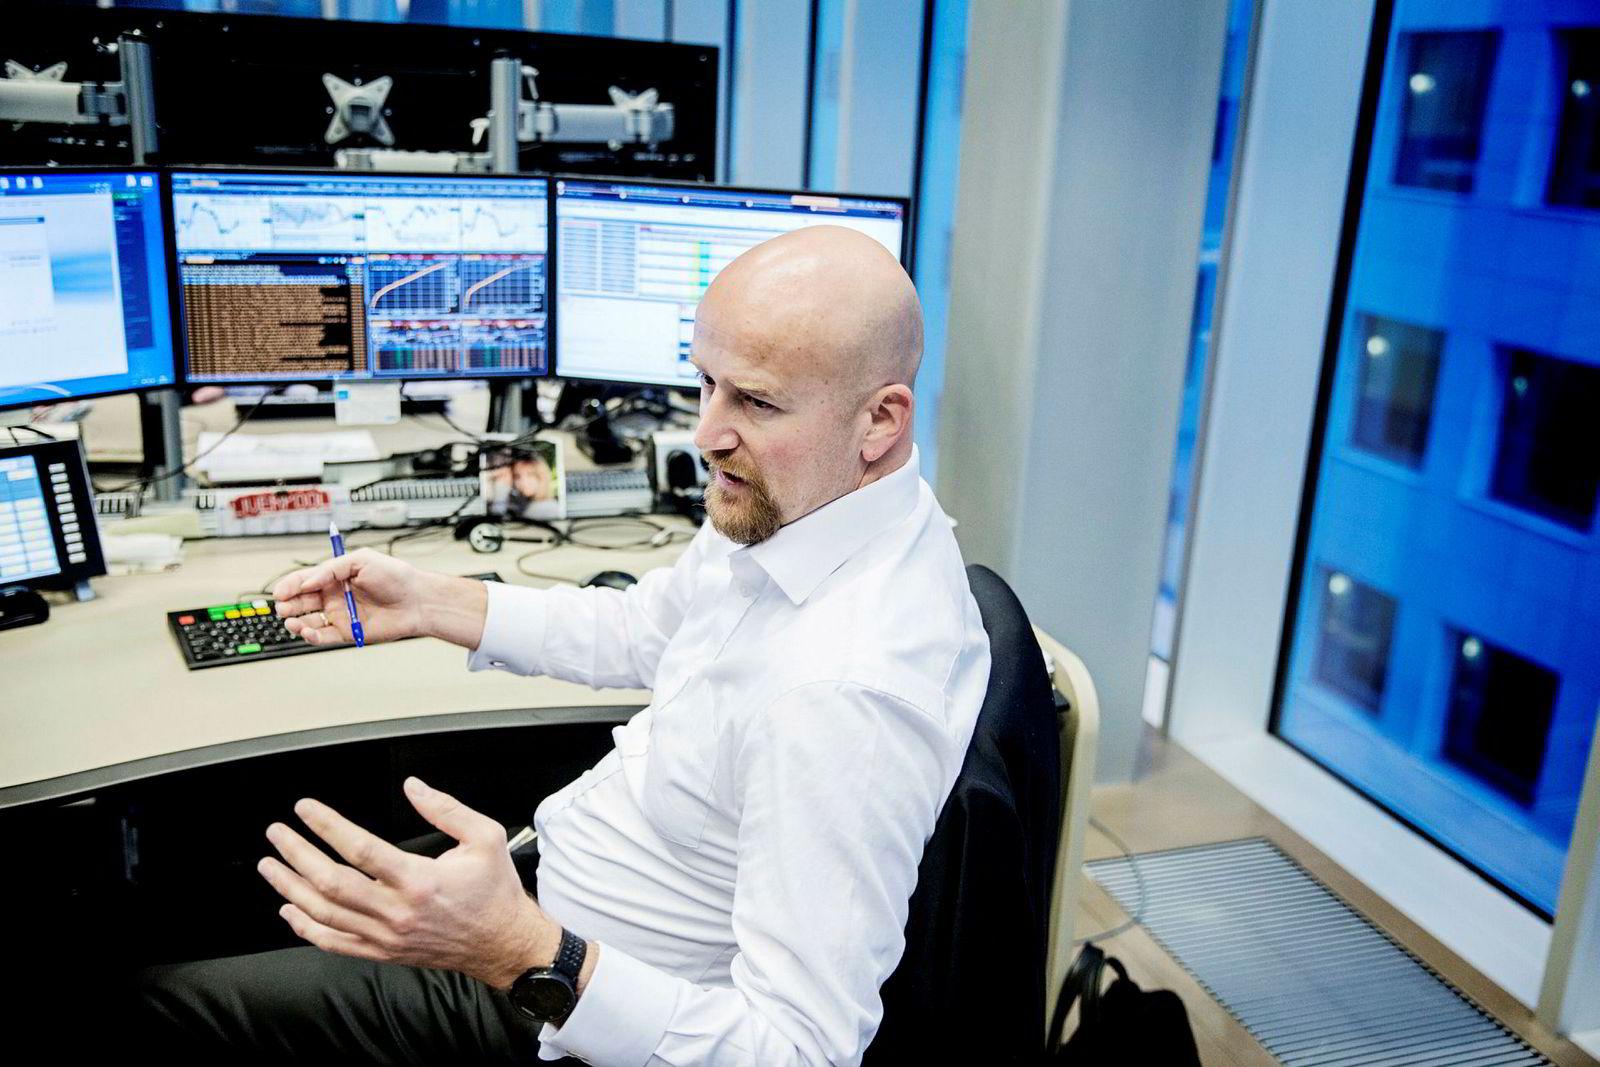 Oljeanalytiker Torbjørn Kjus tror oljeprisen faller til 60 dollar fatet.